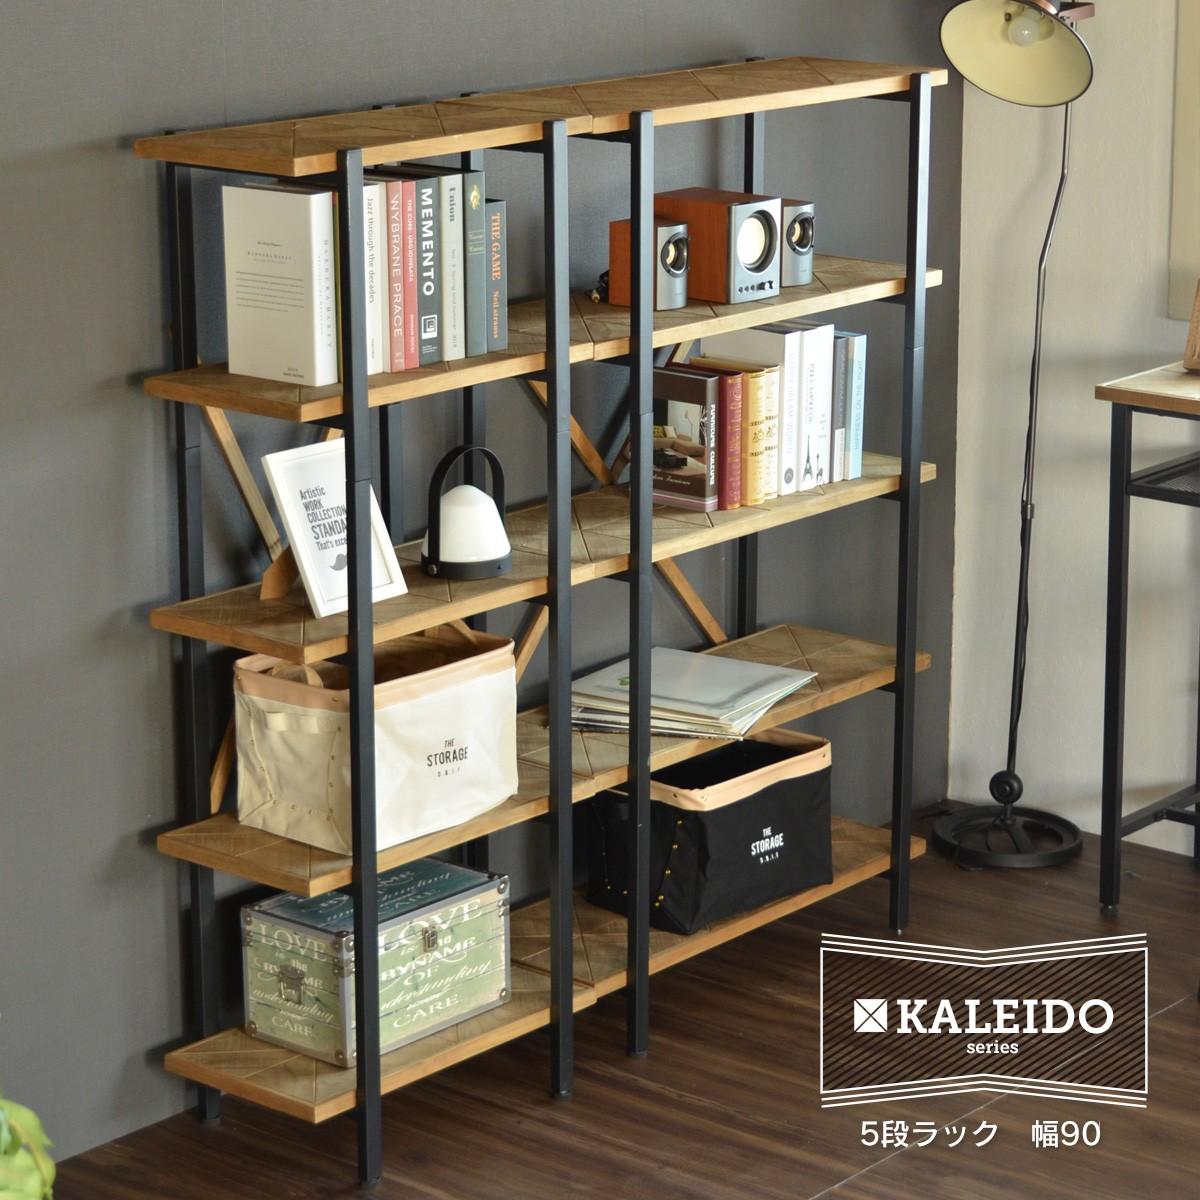 KALEIDO カレイド 5段ラック 幅90 オープン 収納 木製 棚 本棚 シェルフ 間仕切り ディスプレイ コンパクト スリム 省スペース 一人暮らし リビング おしゃれ デザイン